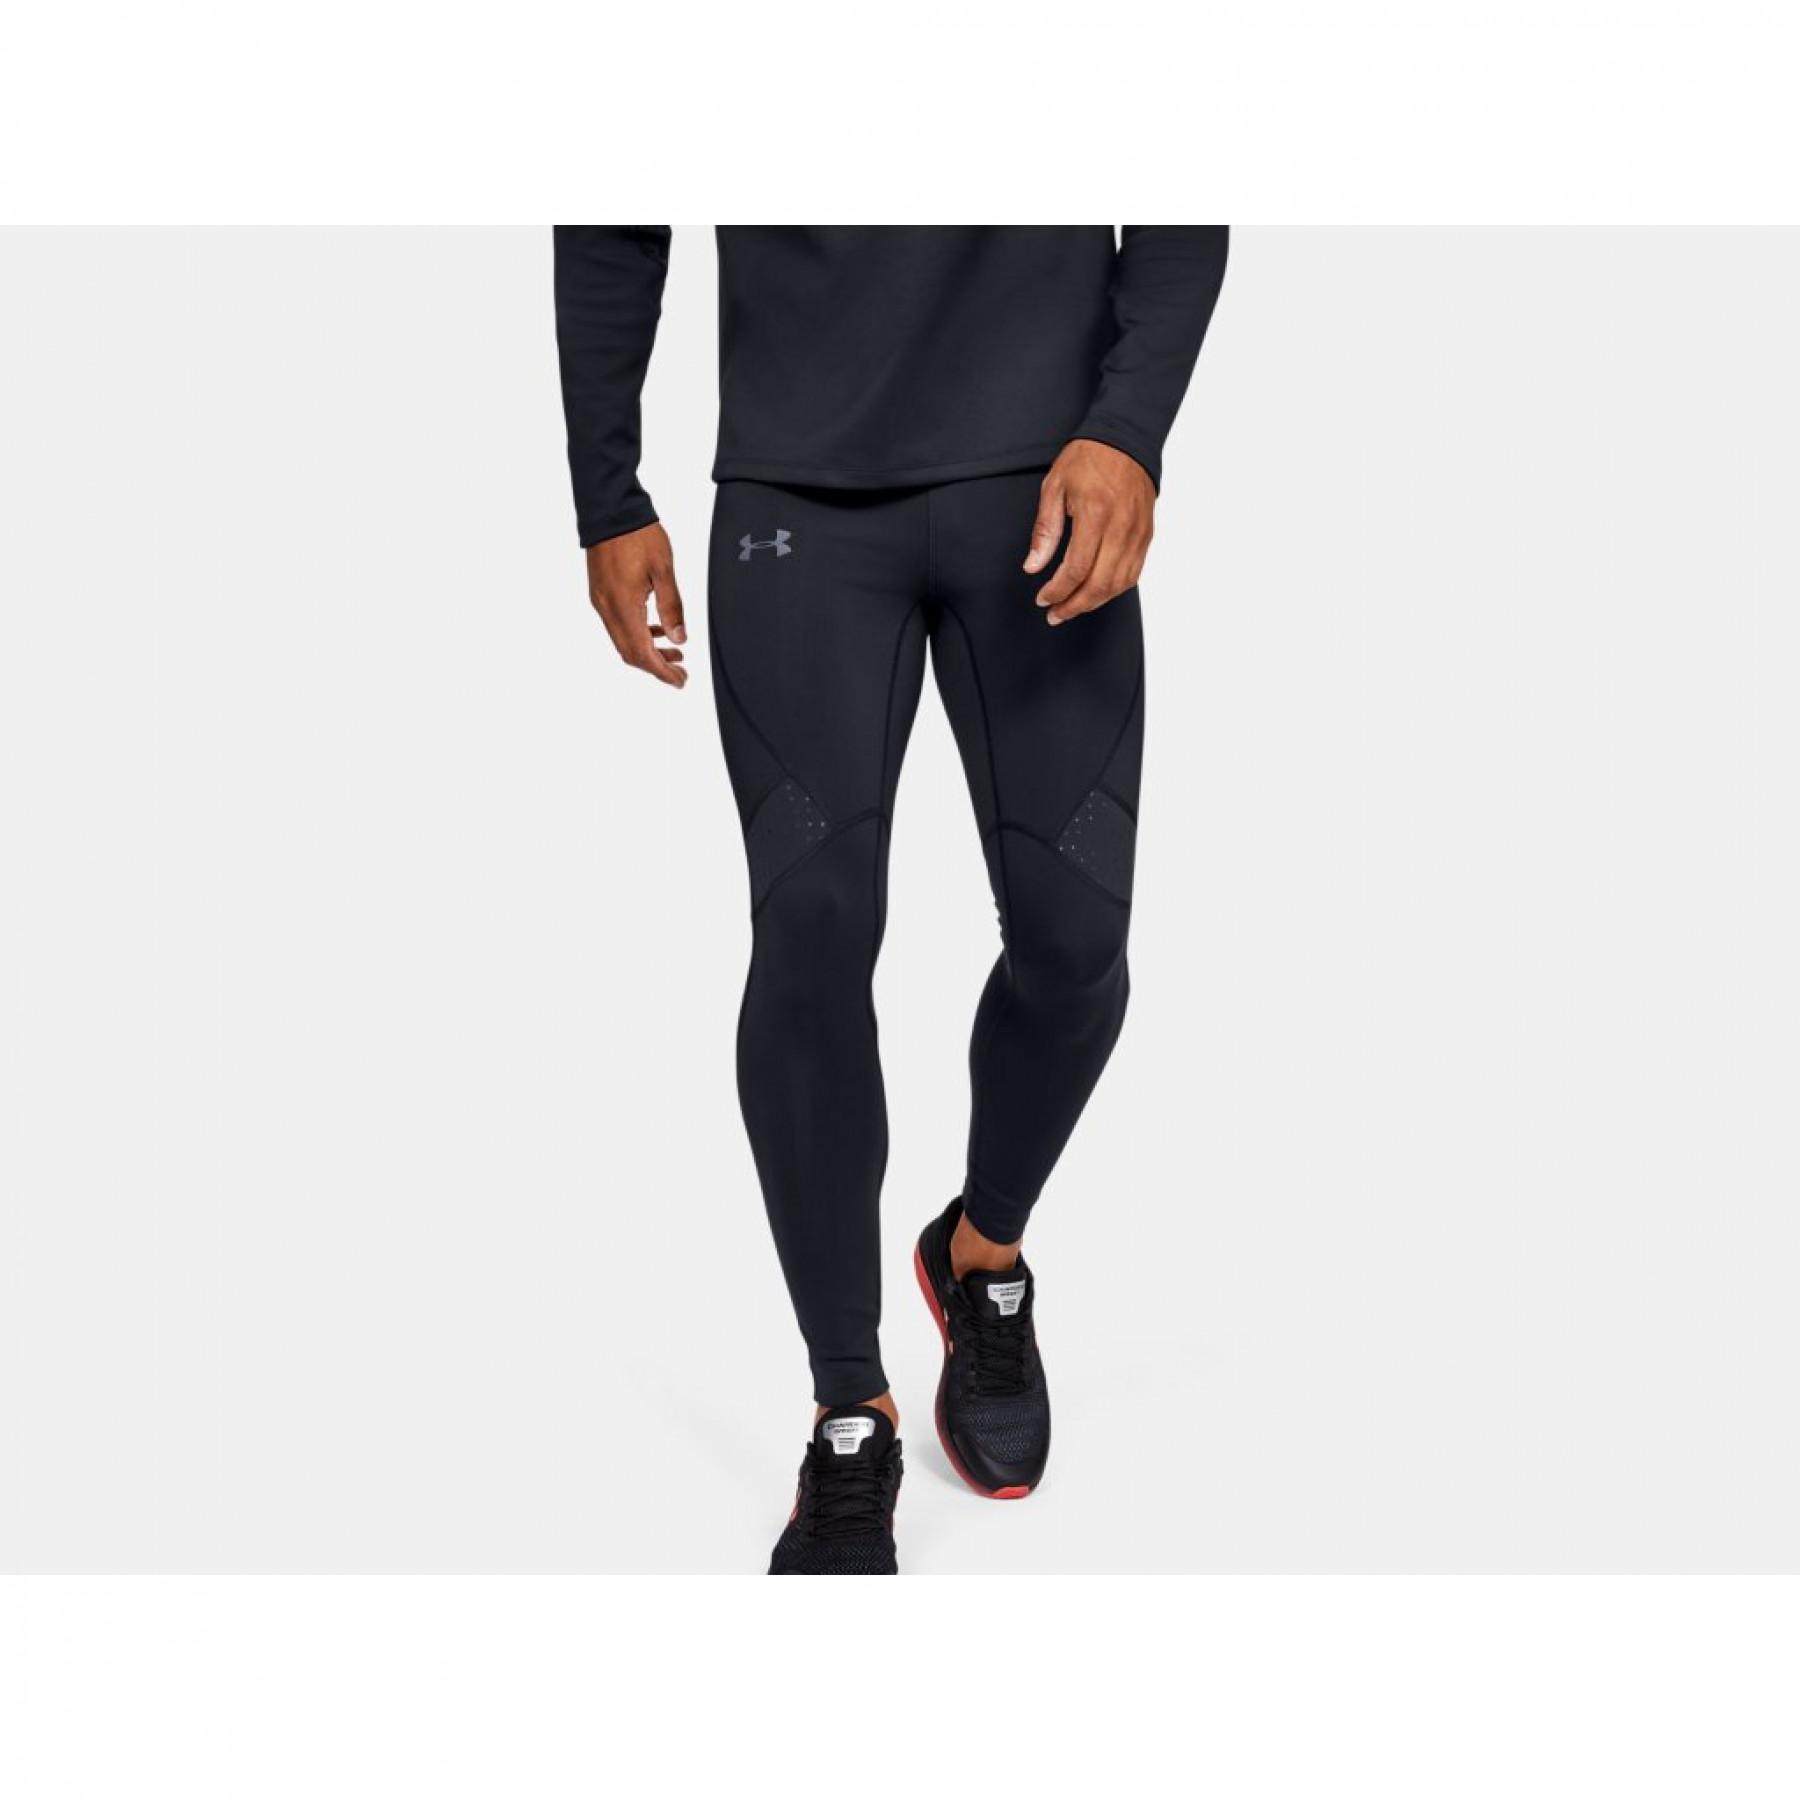 Legging Under Armour Qualifier ColdGear®